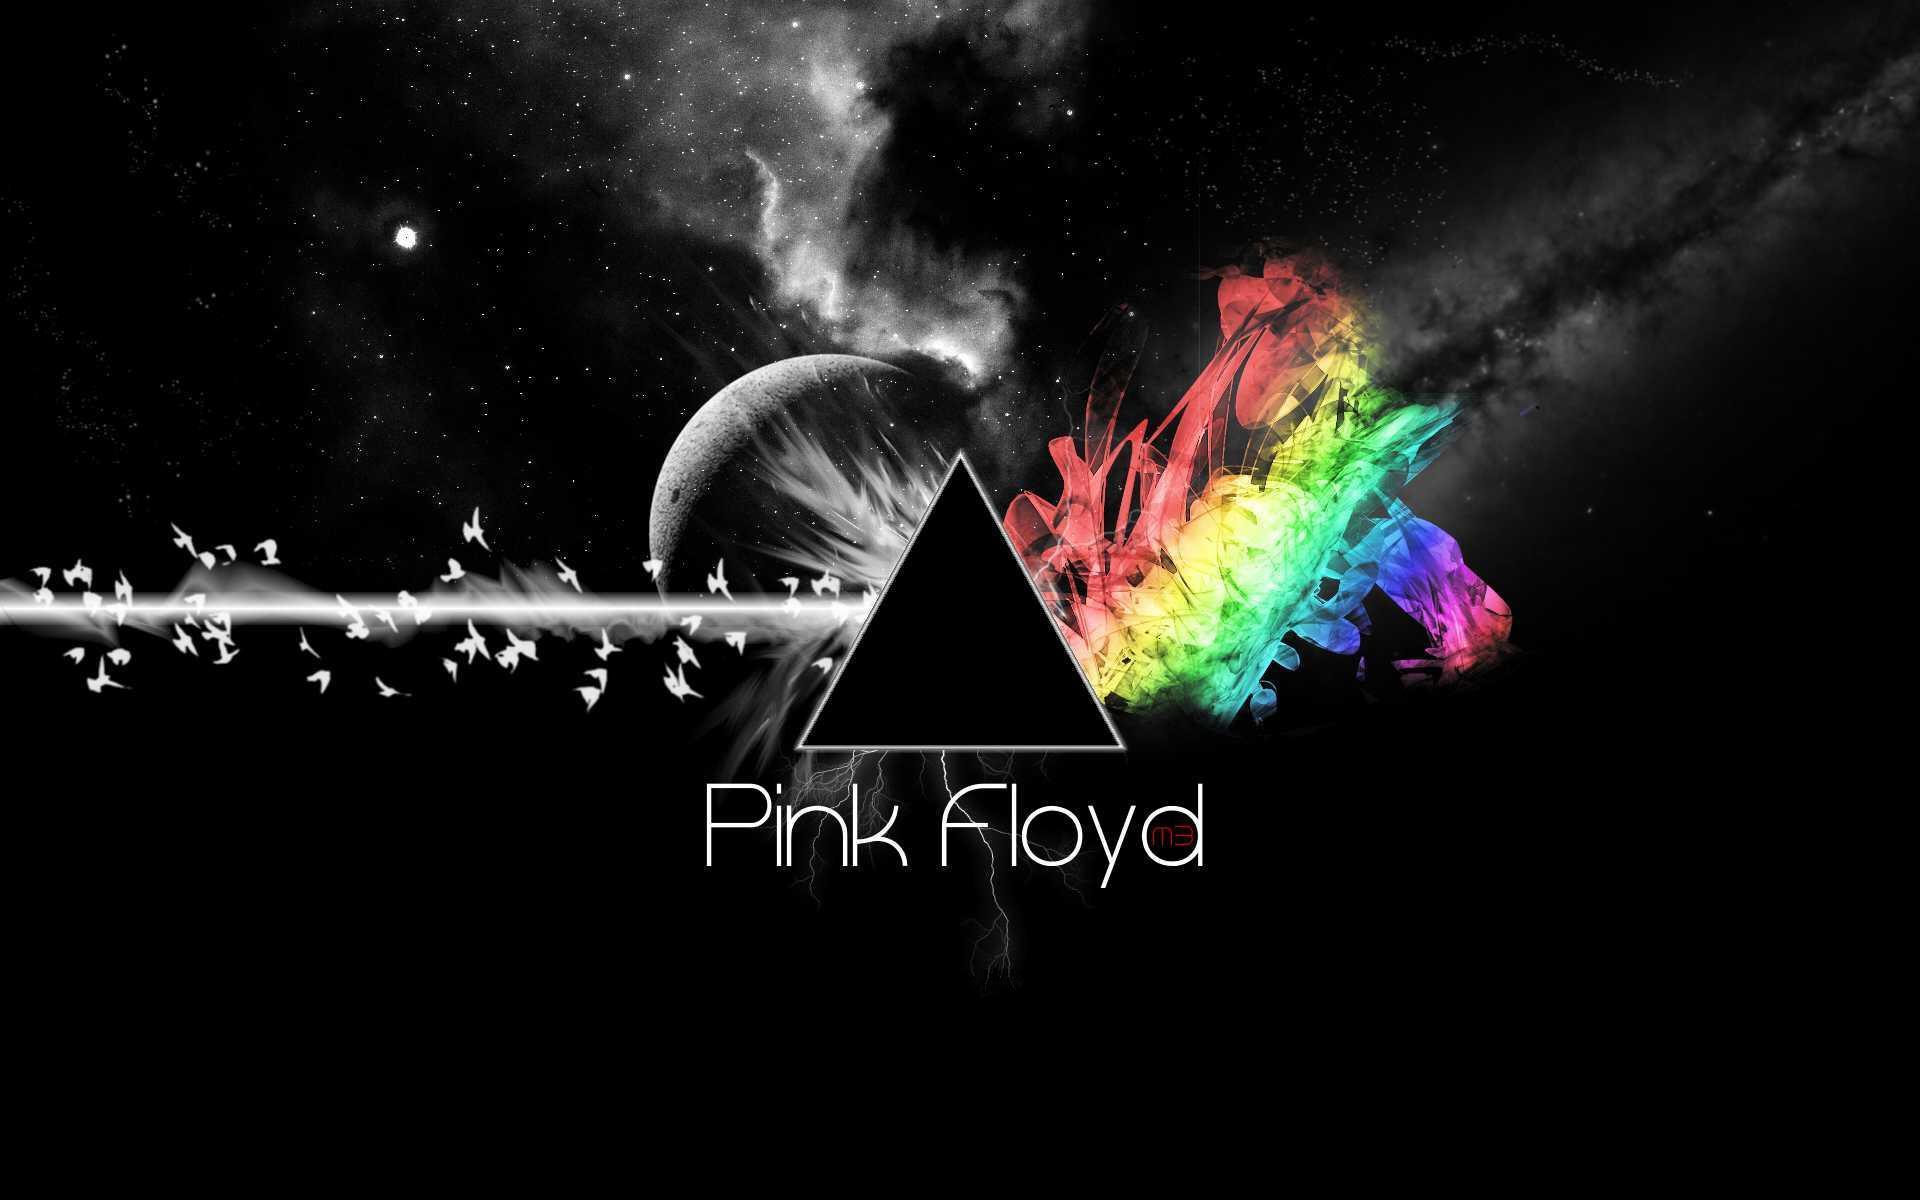 Free download free download pink floyd dark side the moon album